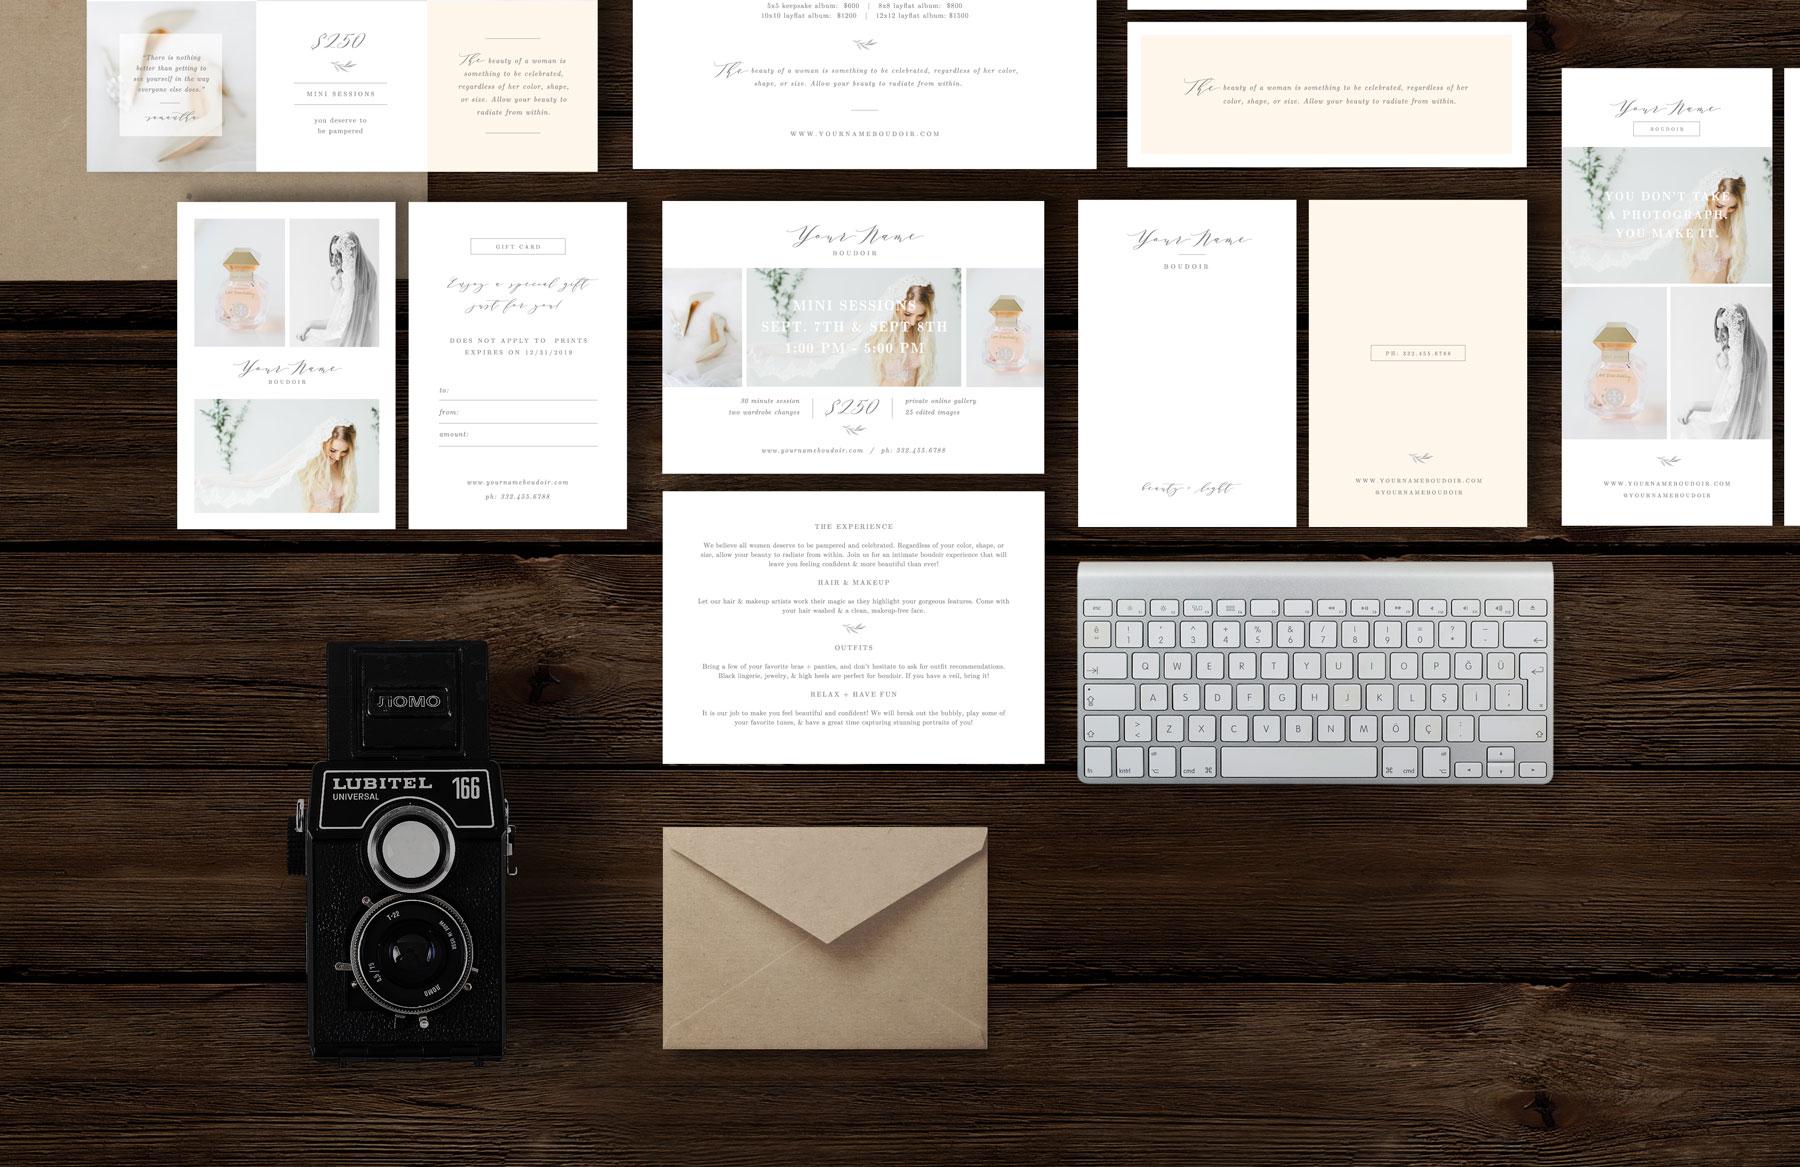 boudoir-marketing-template-designs